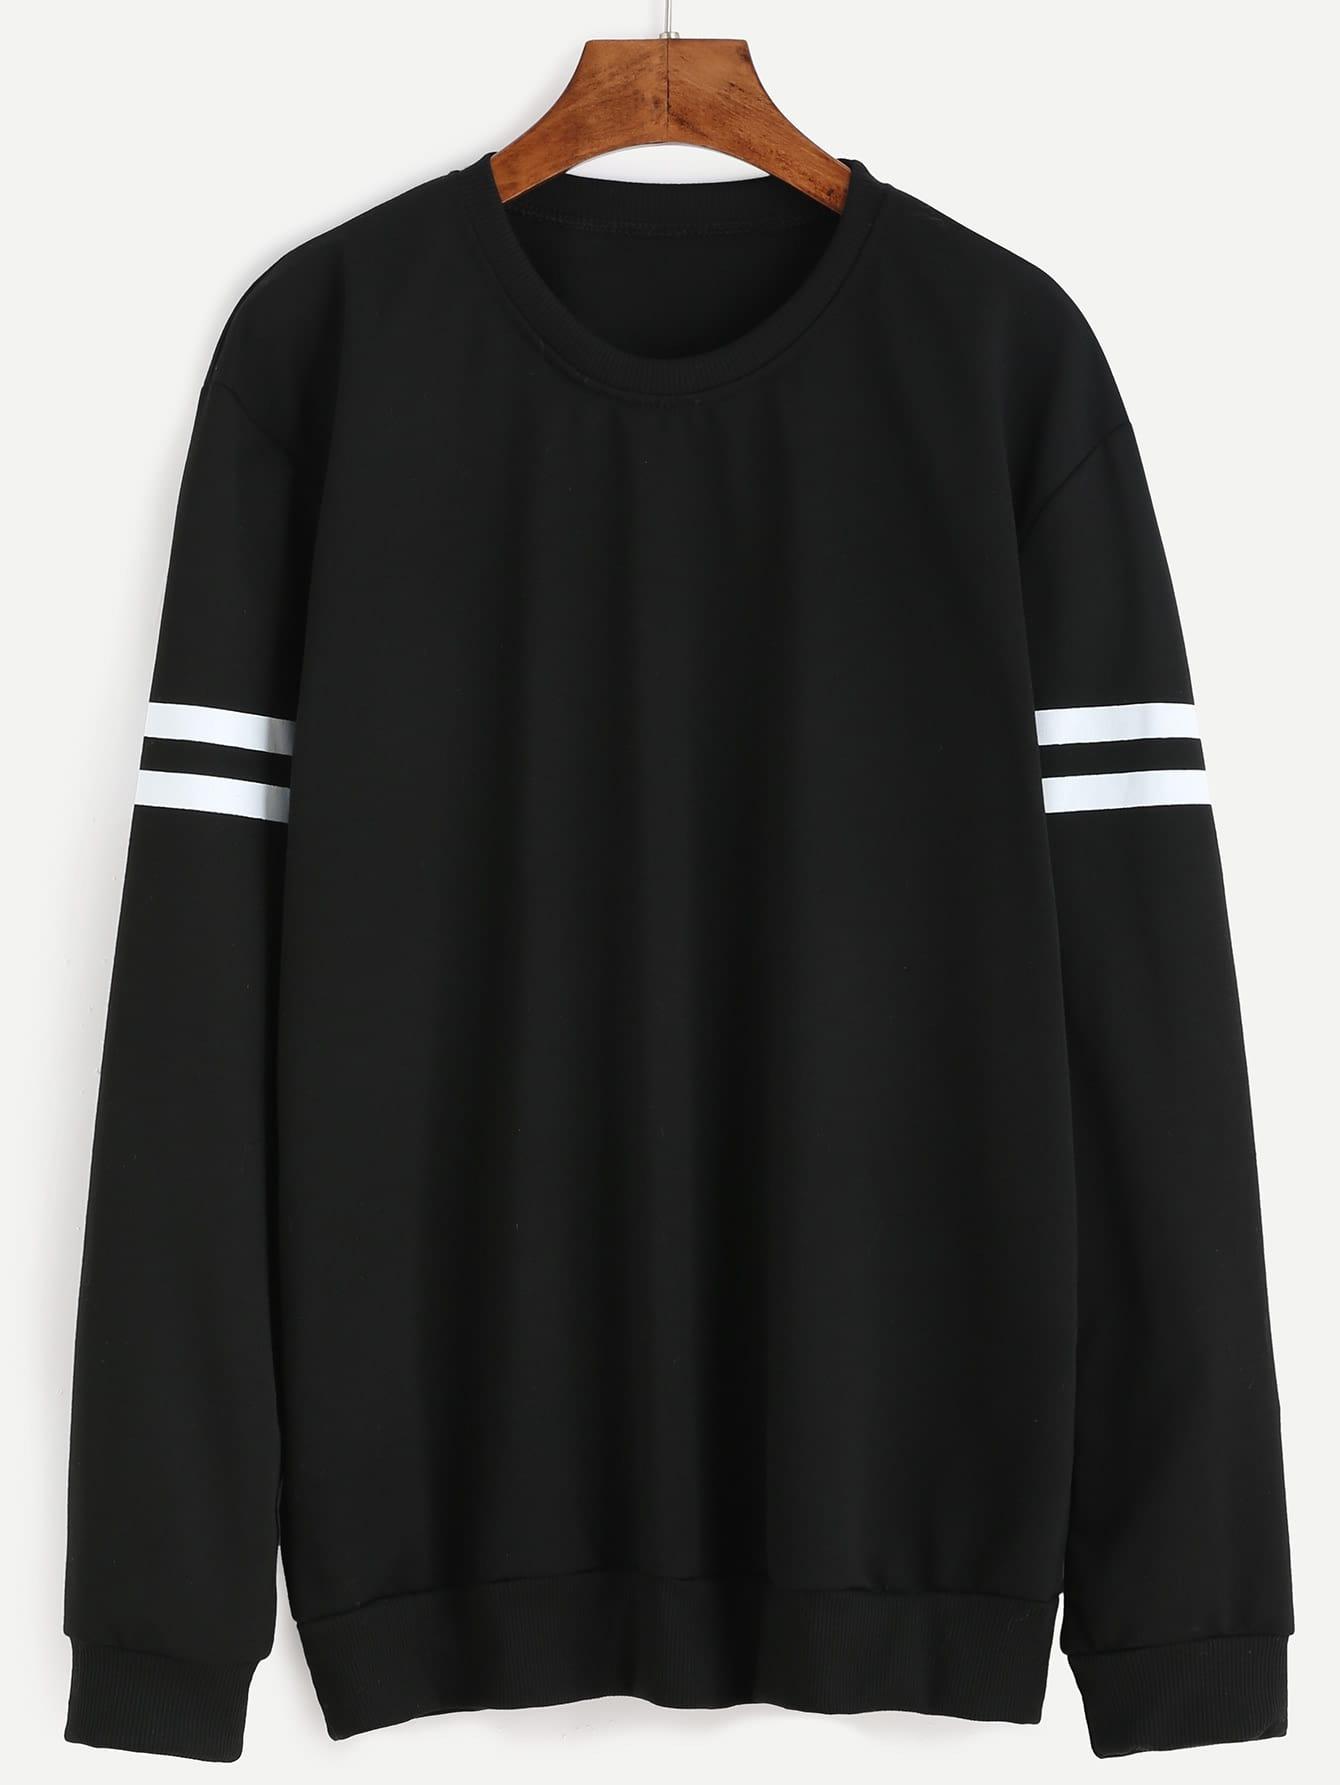 Фото Black Varsity Striped Sweatshirt. Купить с доставкой